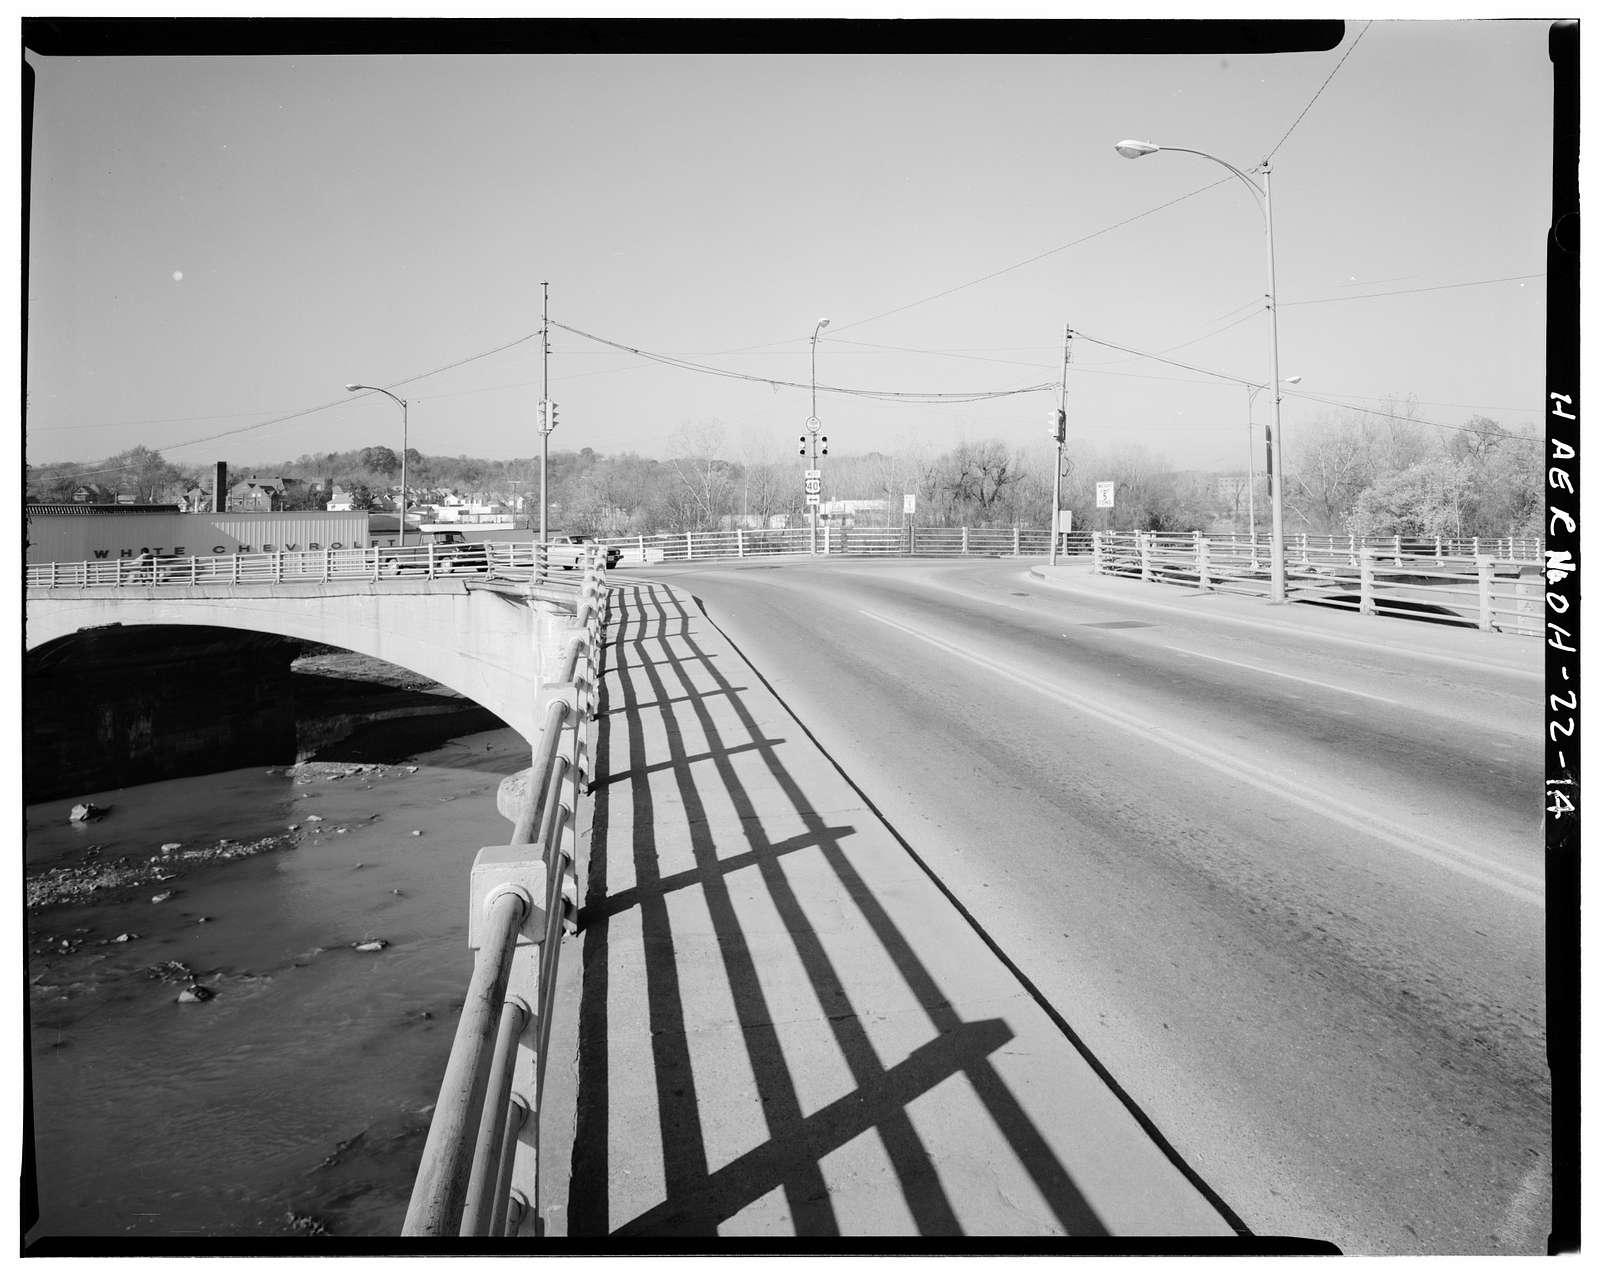 Y-Bridge, Spanning confluence of Muskingham & Licking Rivers, Zanesville, Muskingum County, OH